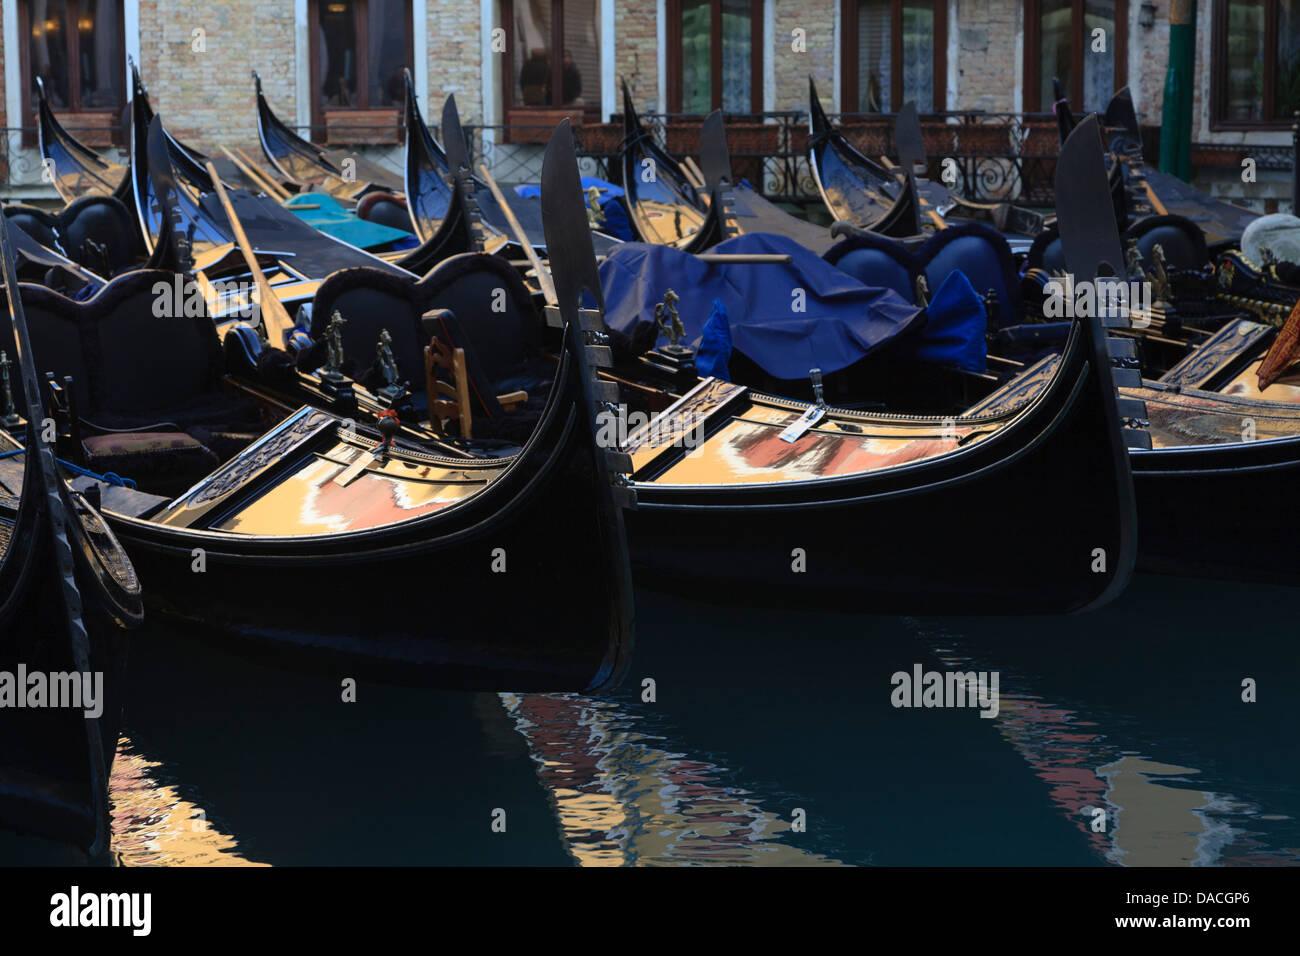 Gondolas parking, Bacino Orseolo, Servizio Gondole, Venice, Italy - Stock Image